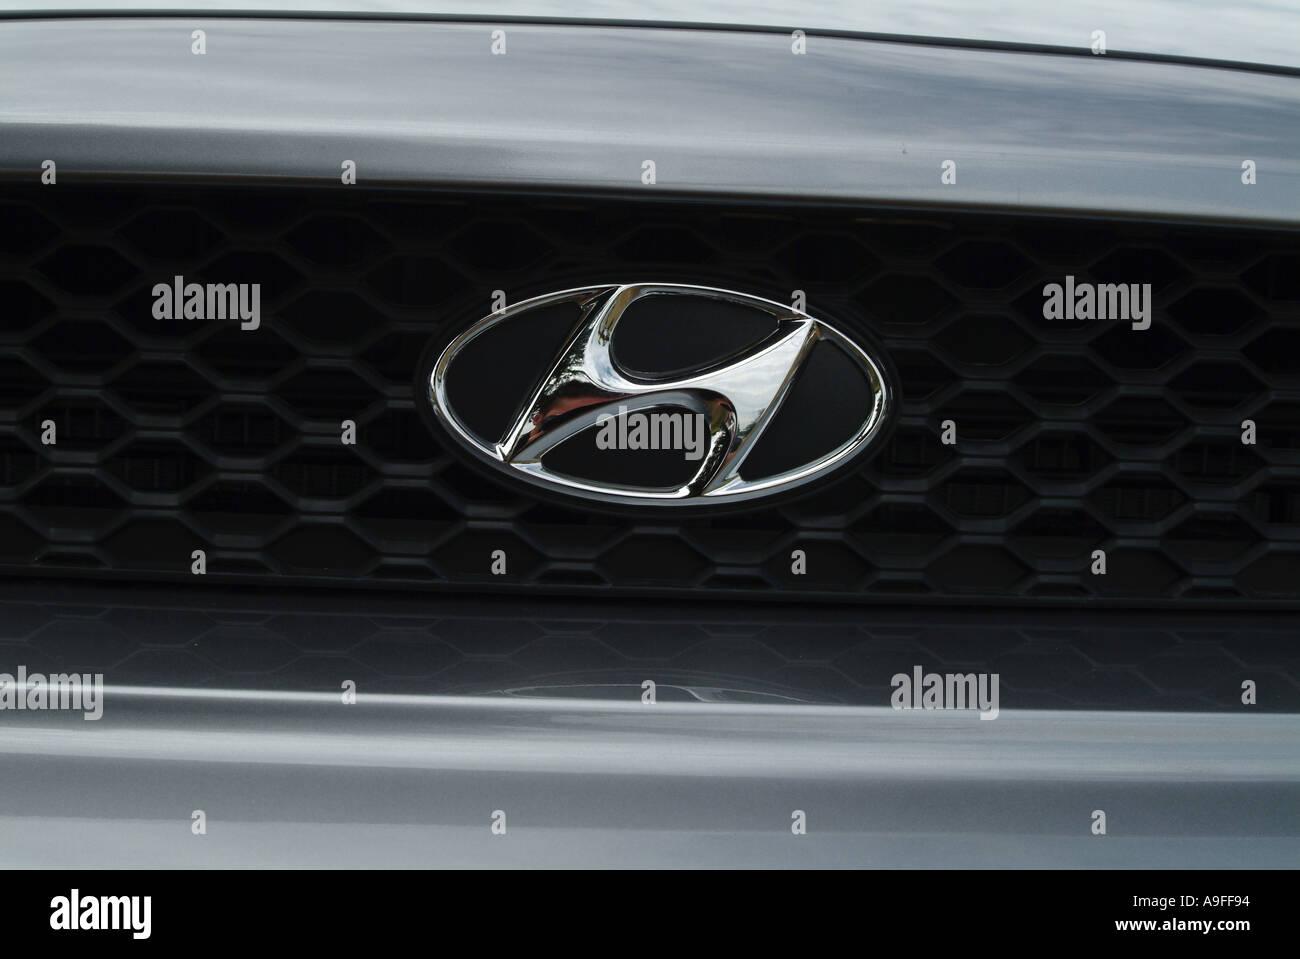 hyundai south korea car maker manufacturer New car Finance dealer ...